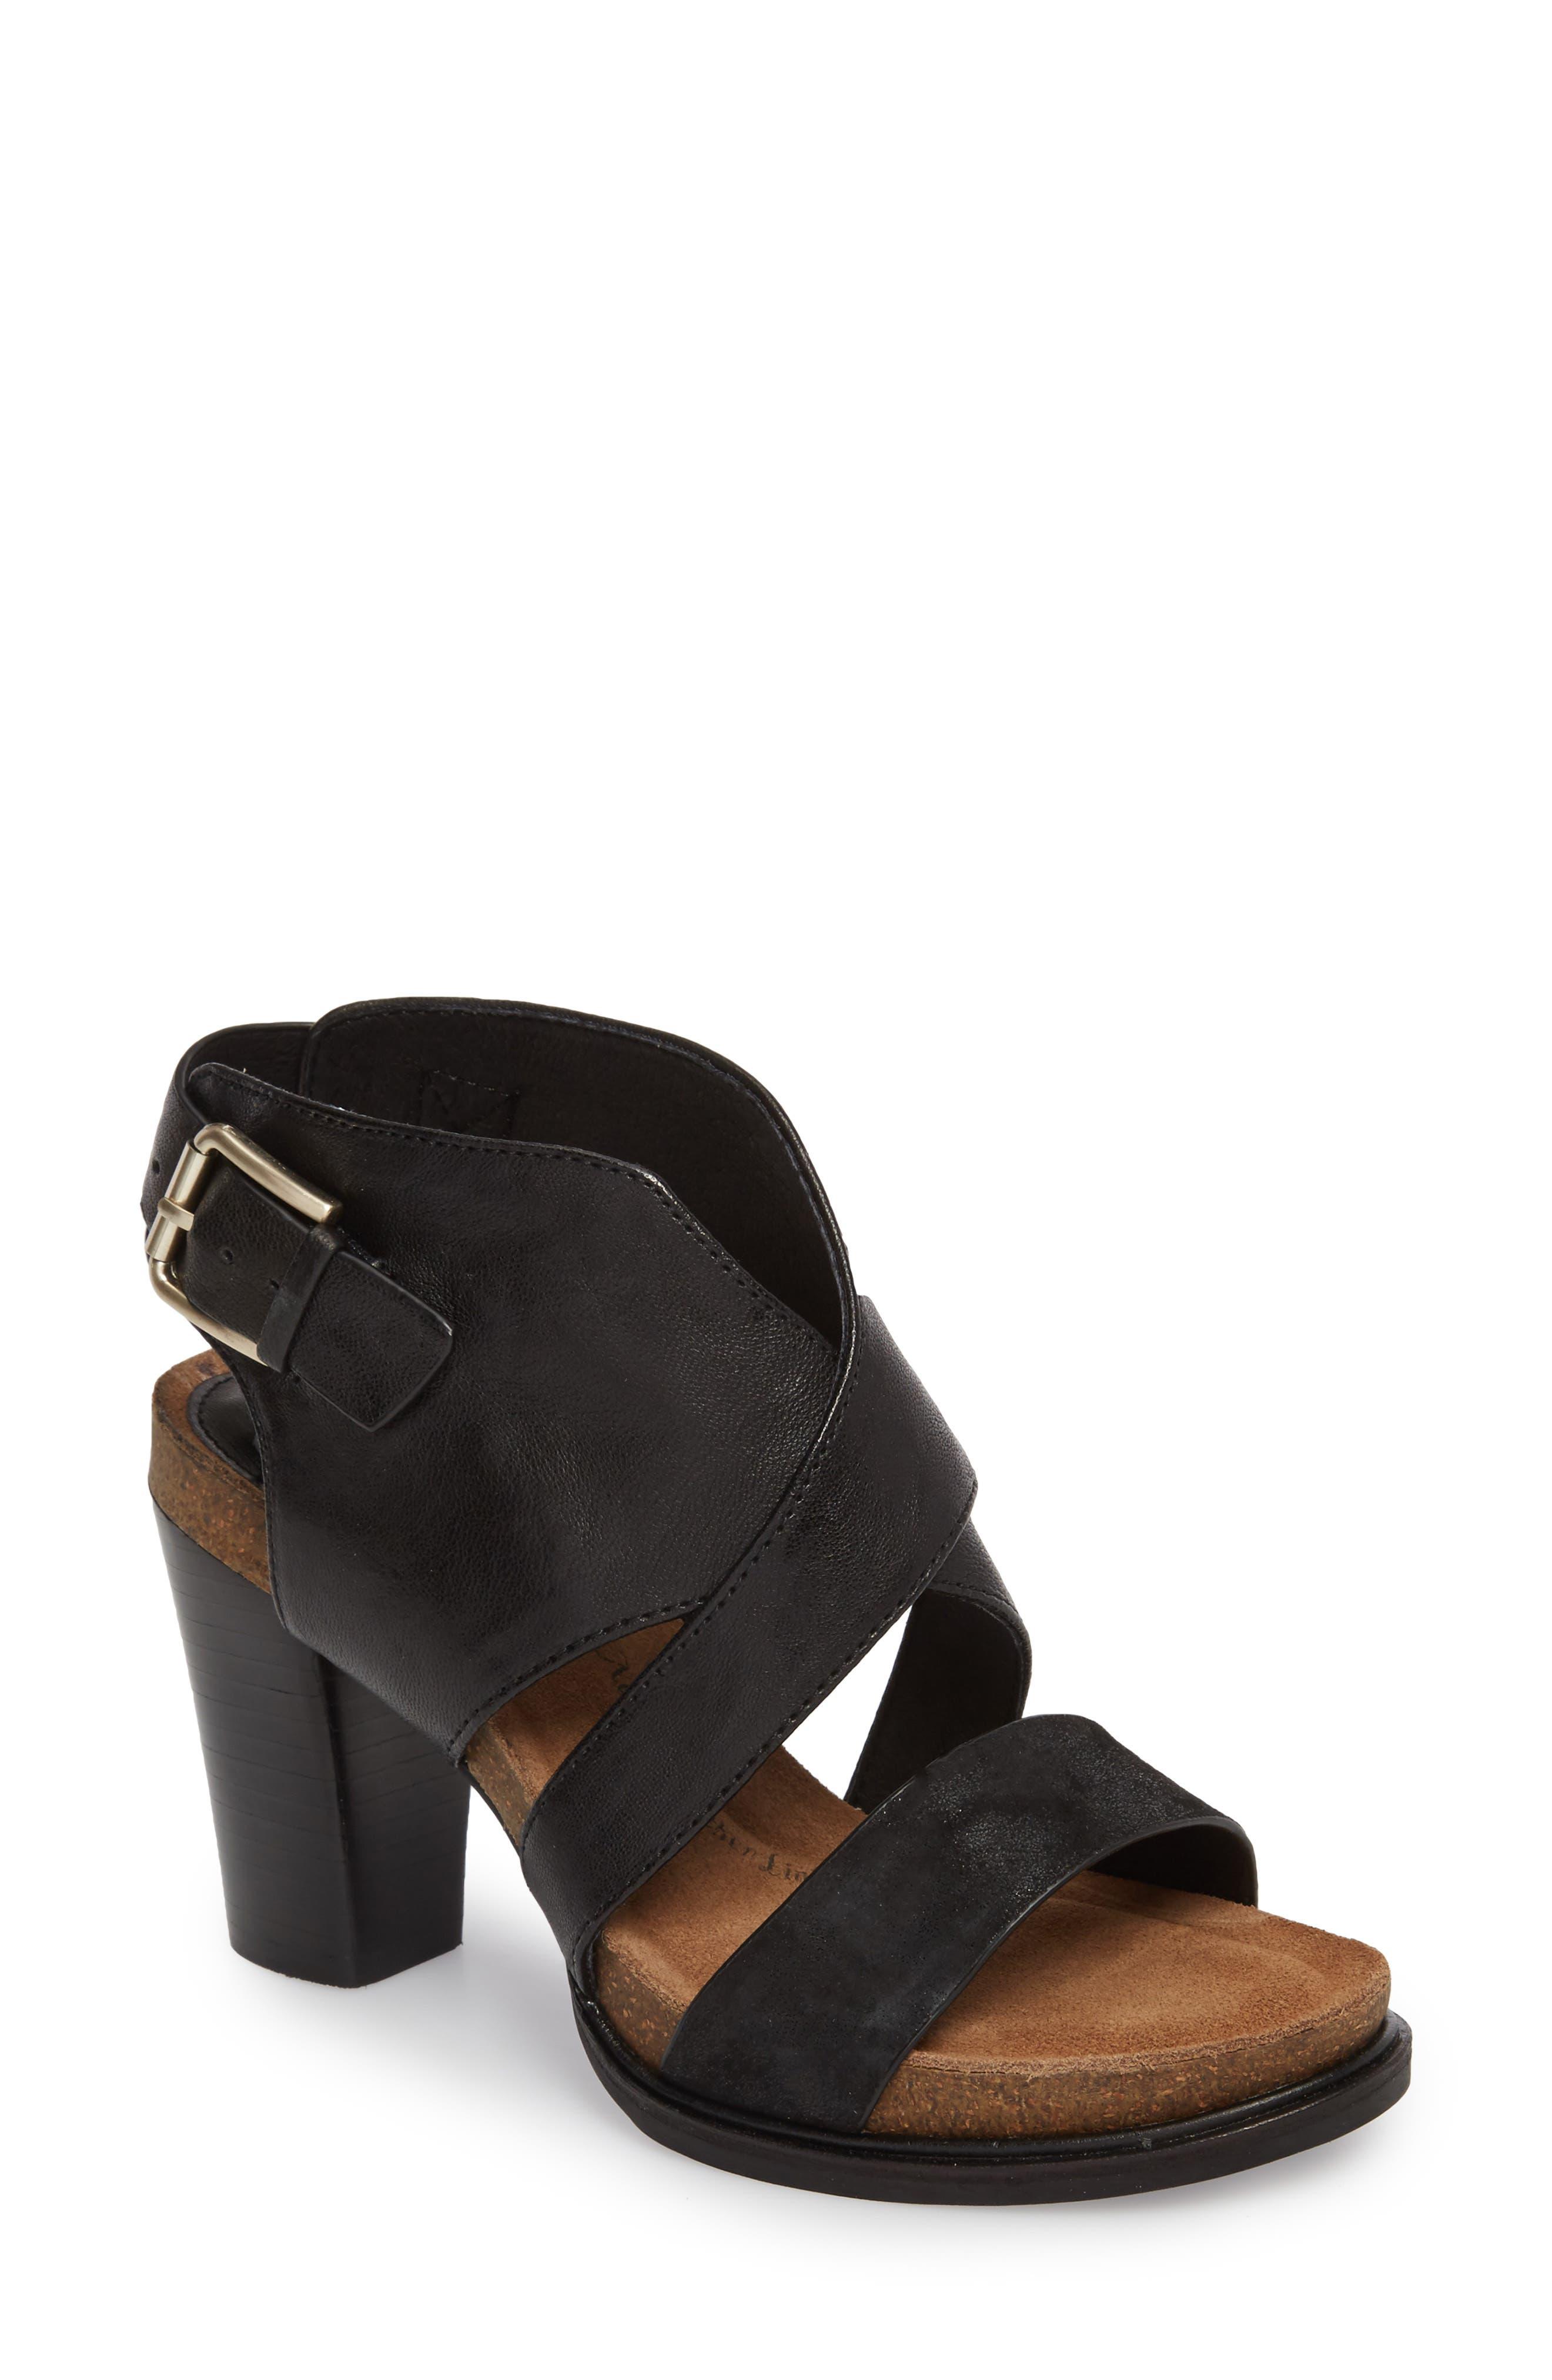 Christine Sandal,                         Main,                         color, Black Leather